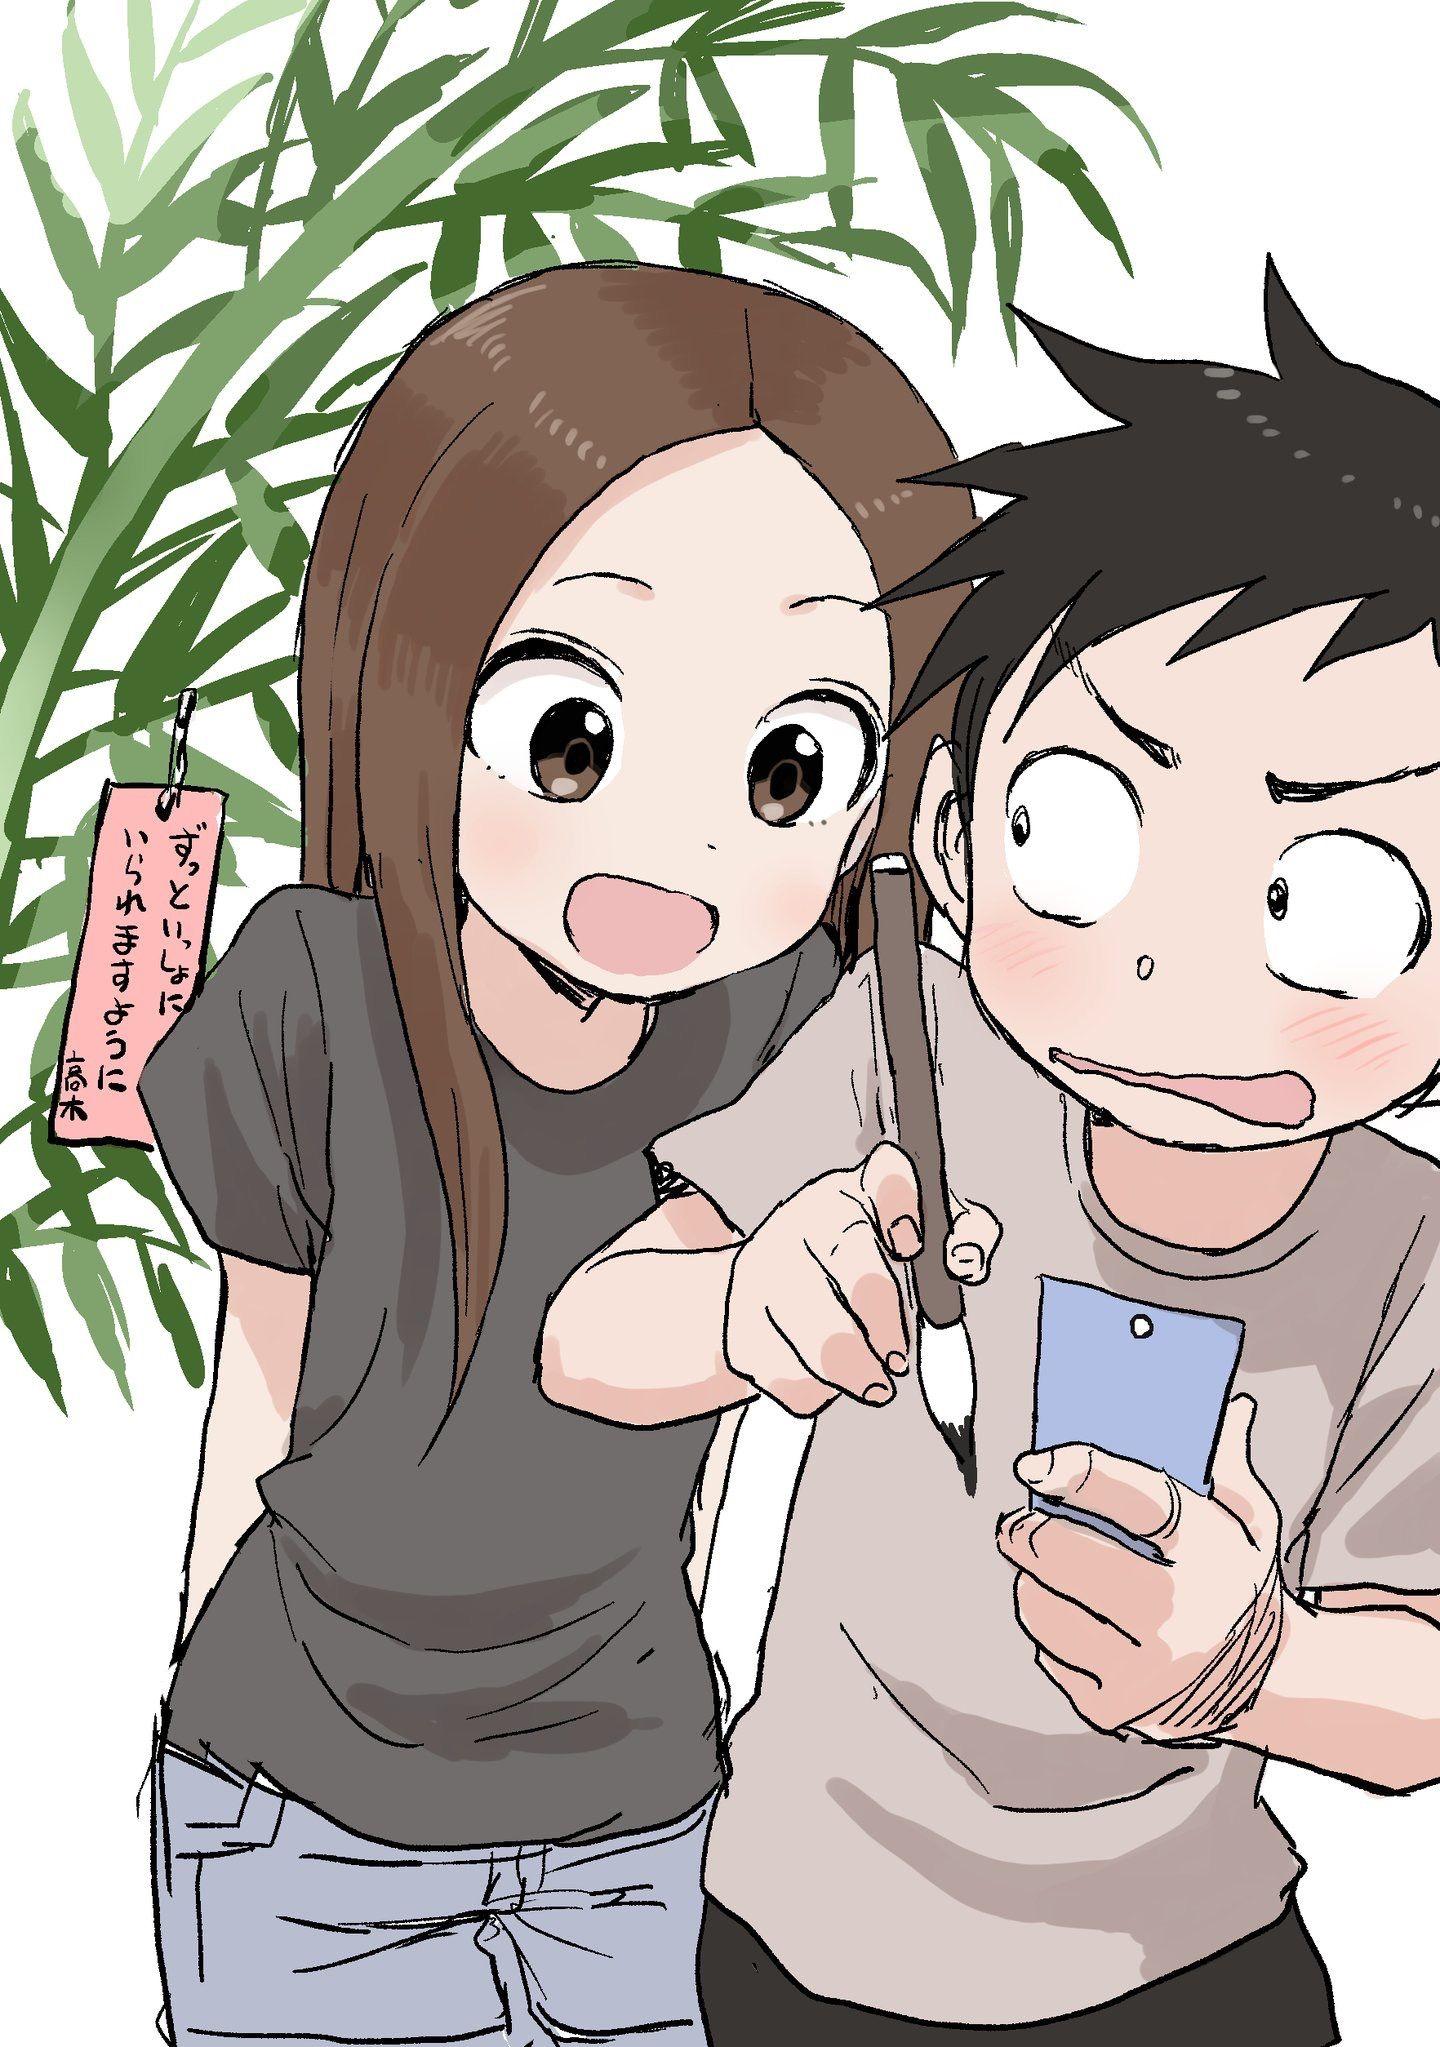 Pin by Hal theShaman on Takagi Takagi, Anime characters